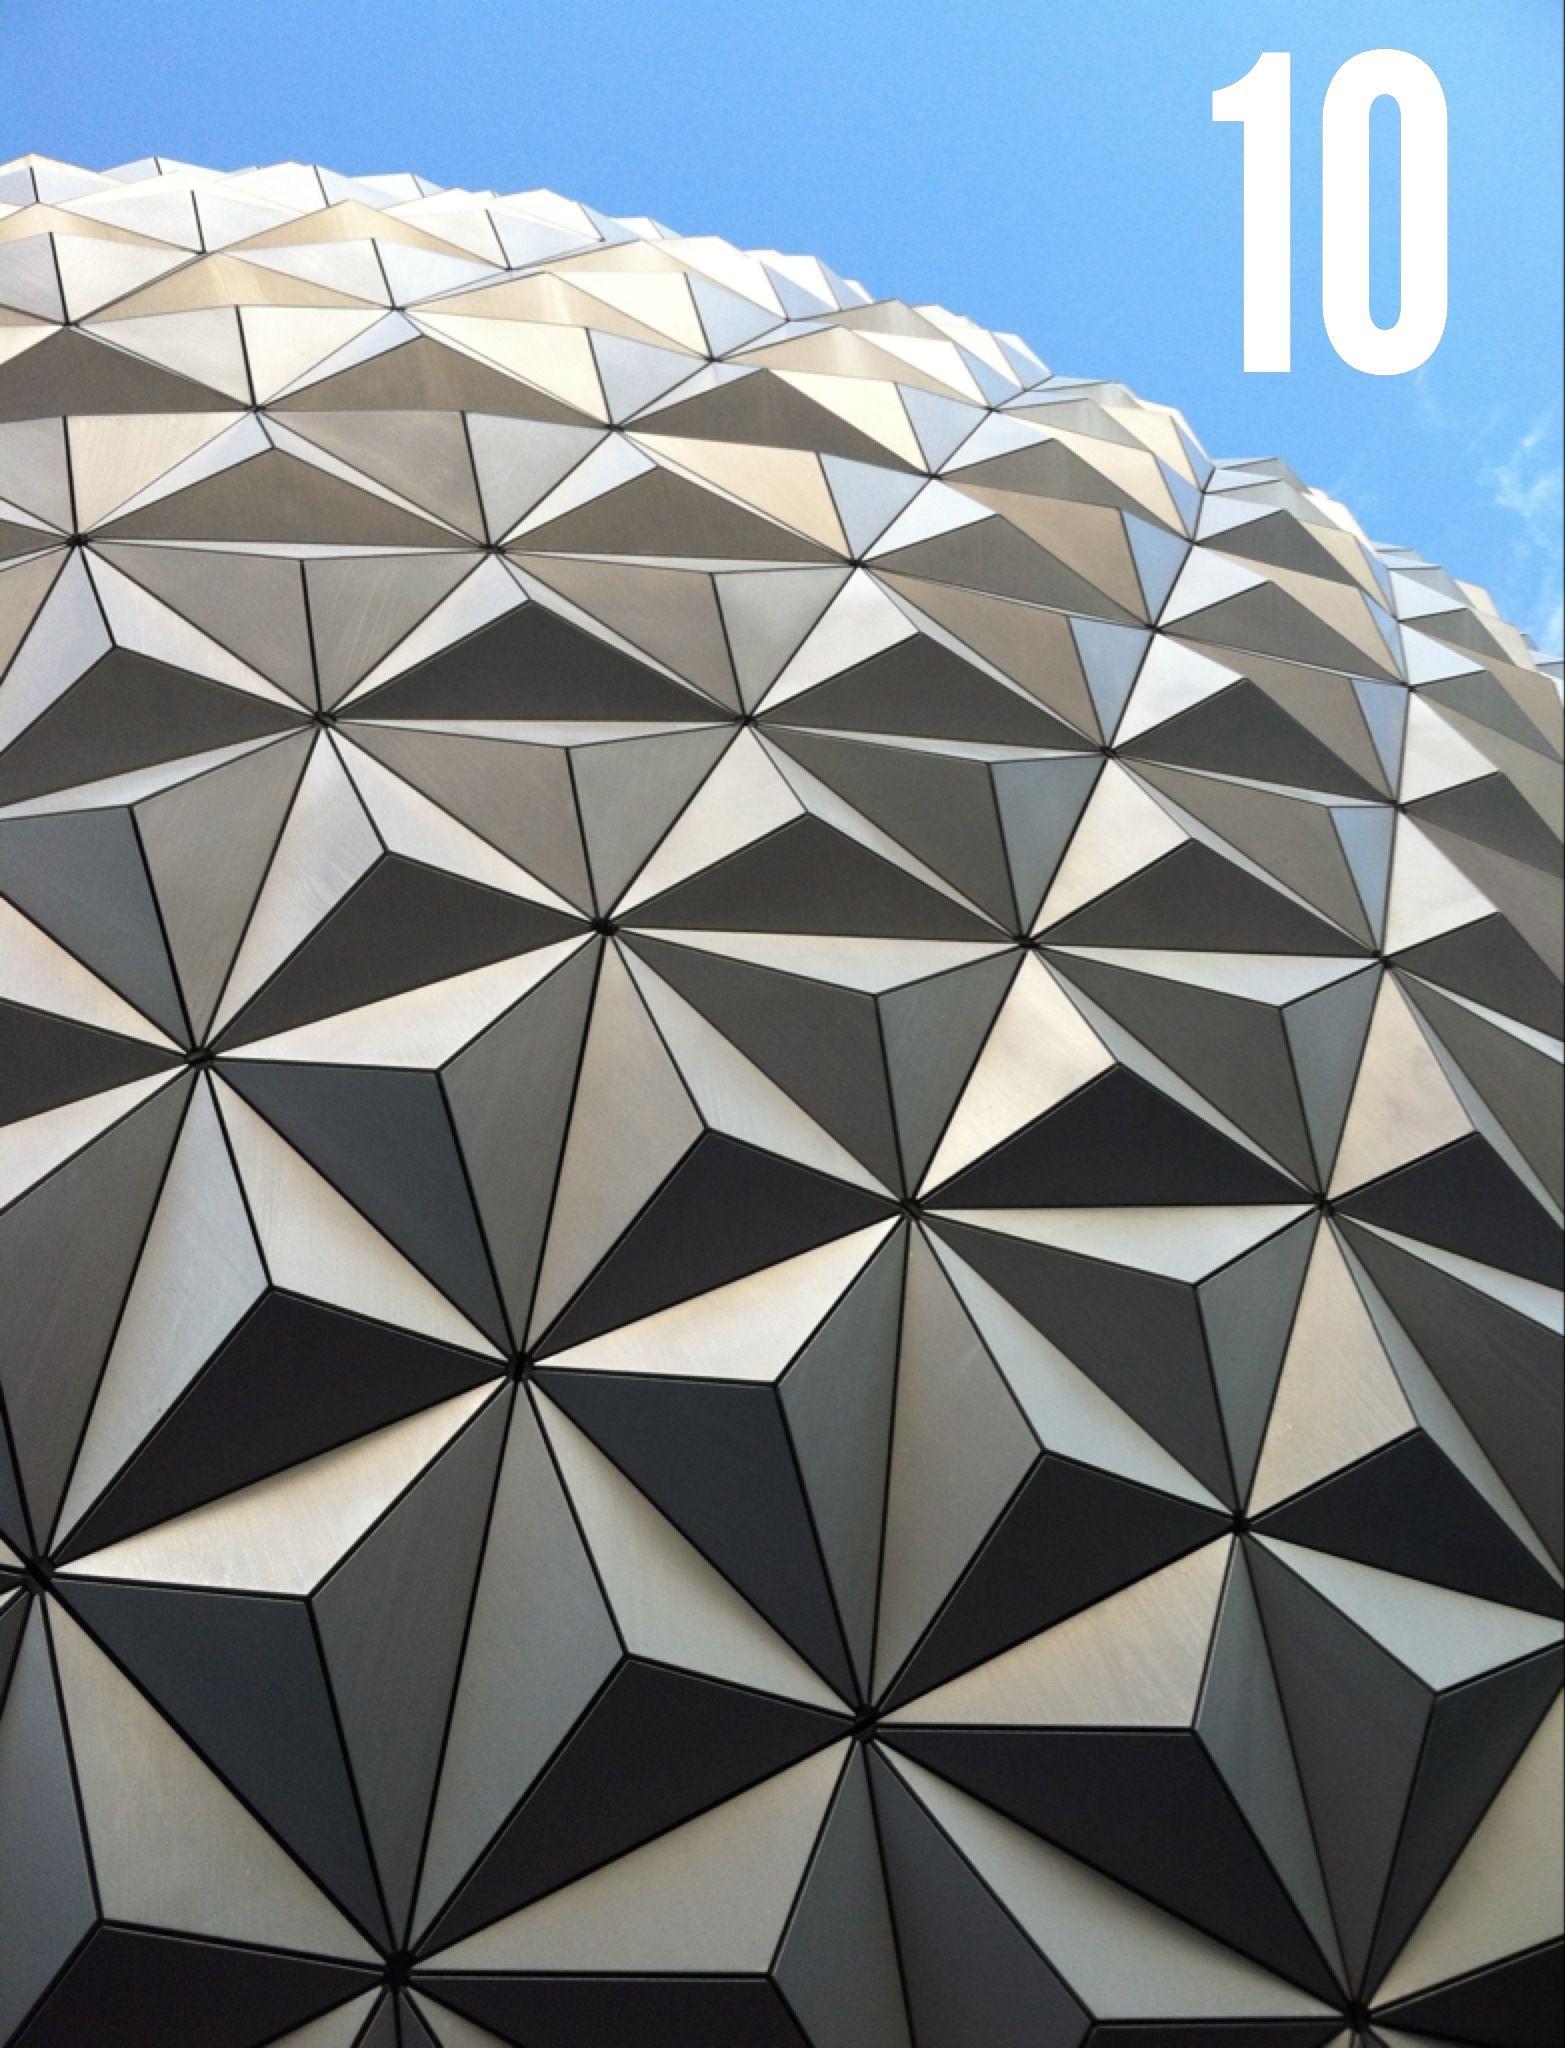 10 Days Until Disney World / Epcot / Spaceship Earth / Disney Vacation Countdown